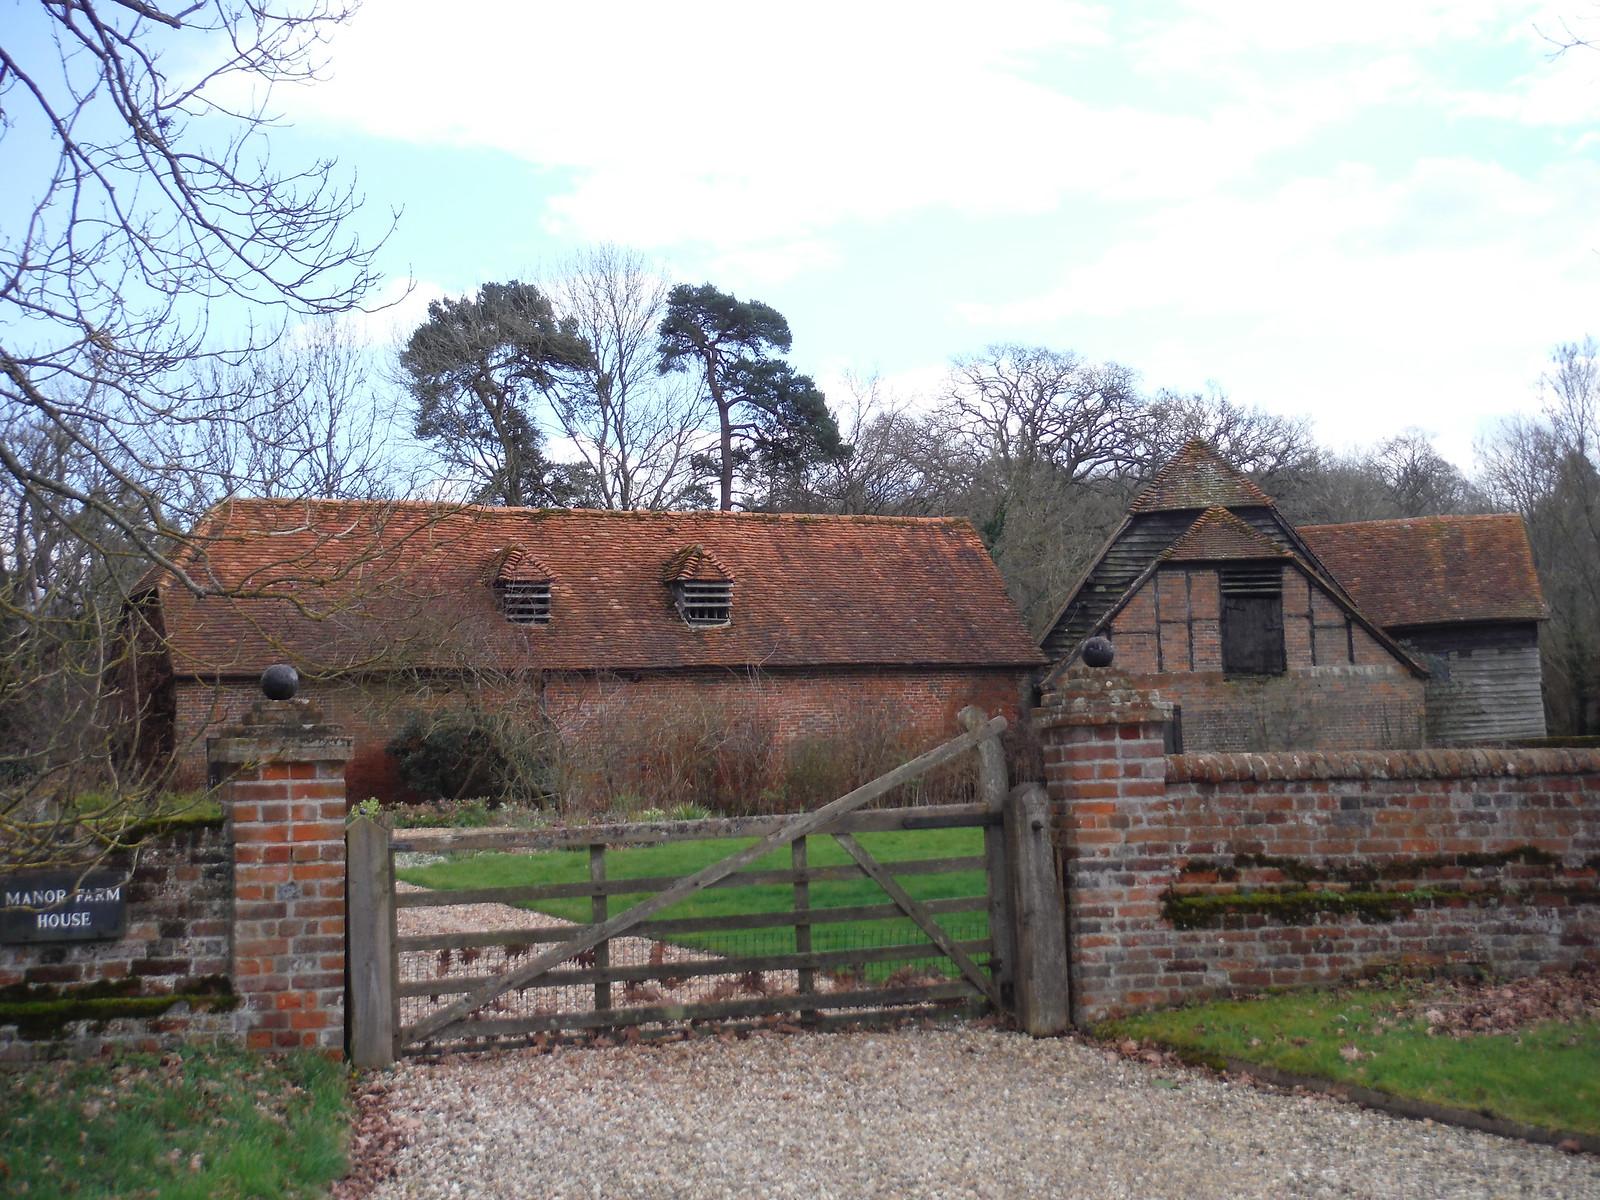 Manor Farm House, Bucklebury SWC Walk 117 Aldermaston to Woolhampton (via Stanford Dingley)